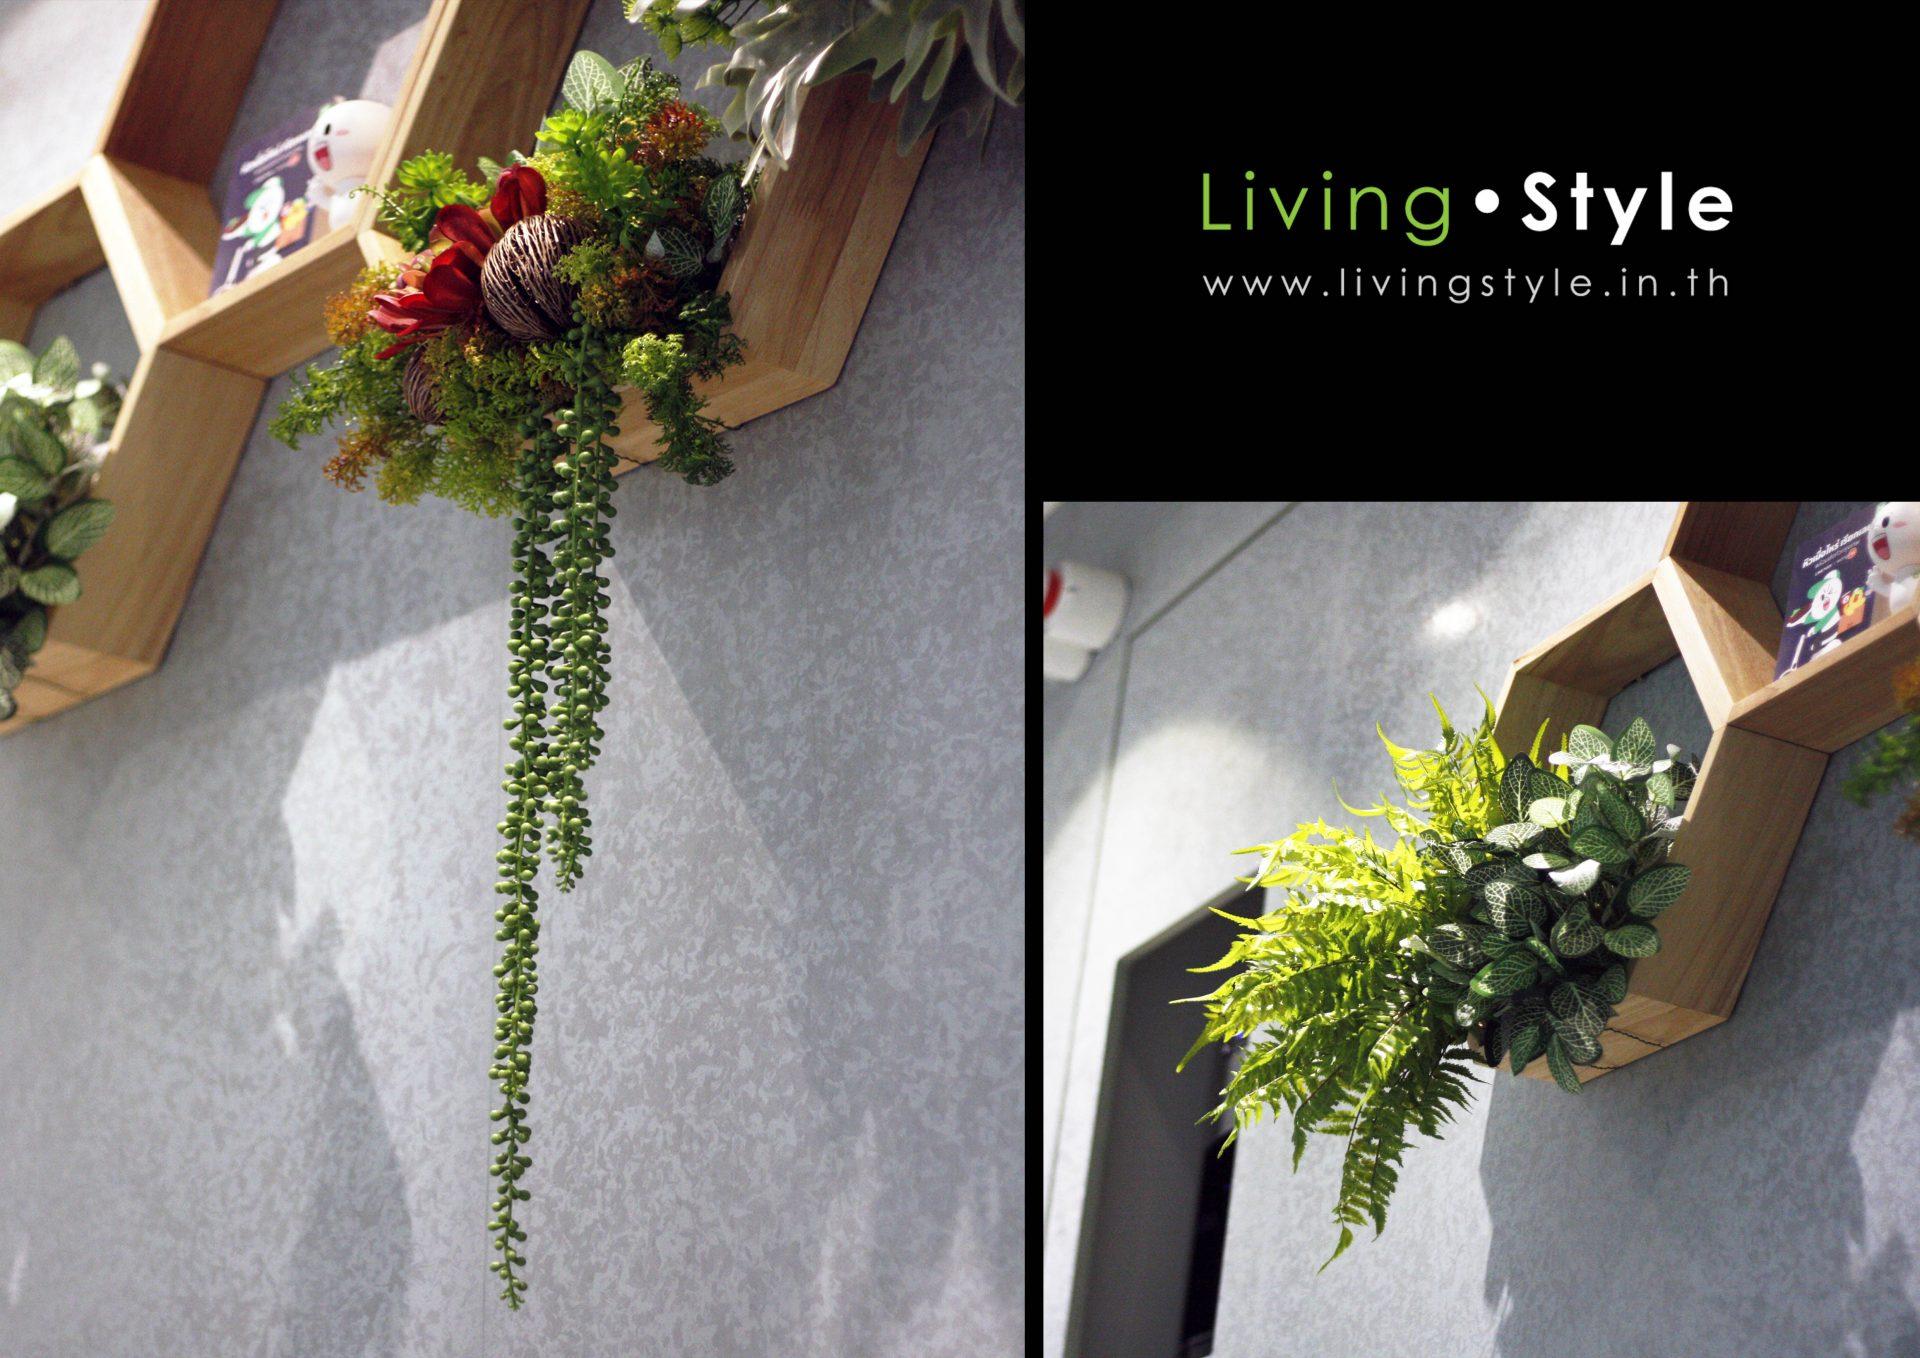 Livingstyle 018-1 catalog